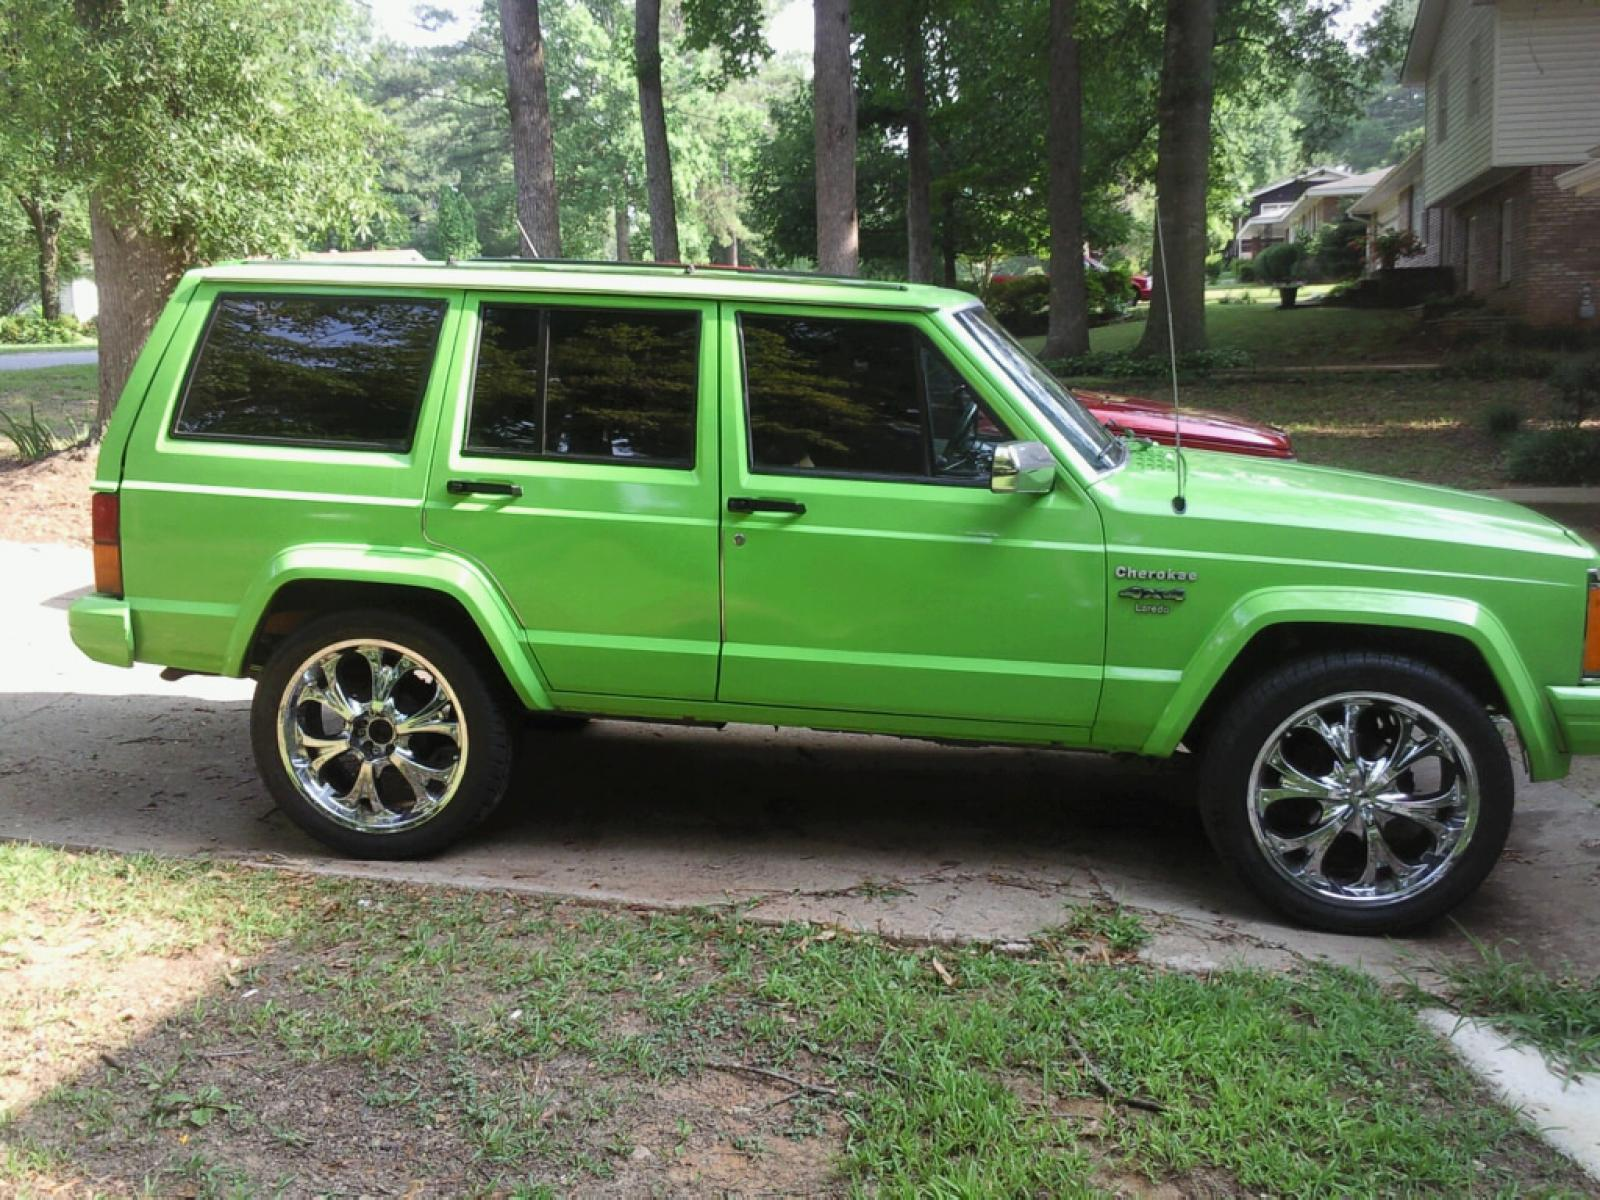 800 1024 1280 1600 Origin 1990 Jeep Cherokee ...